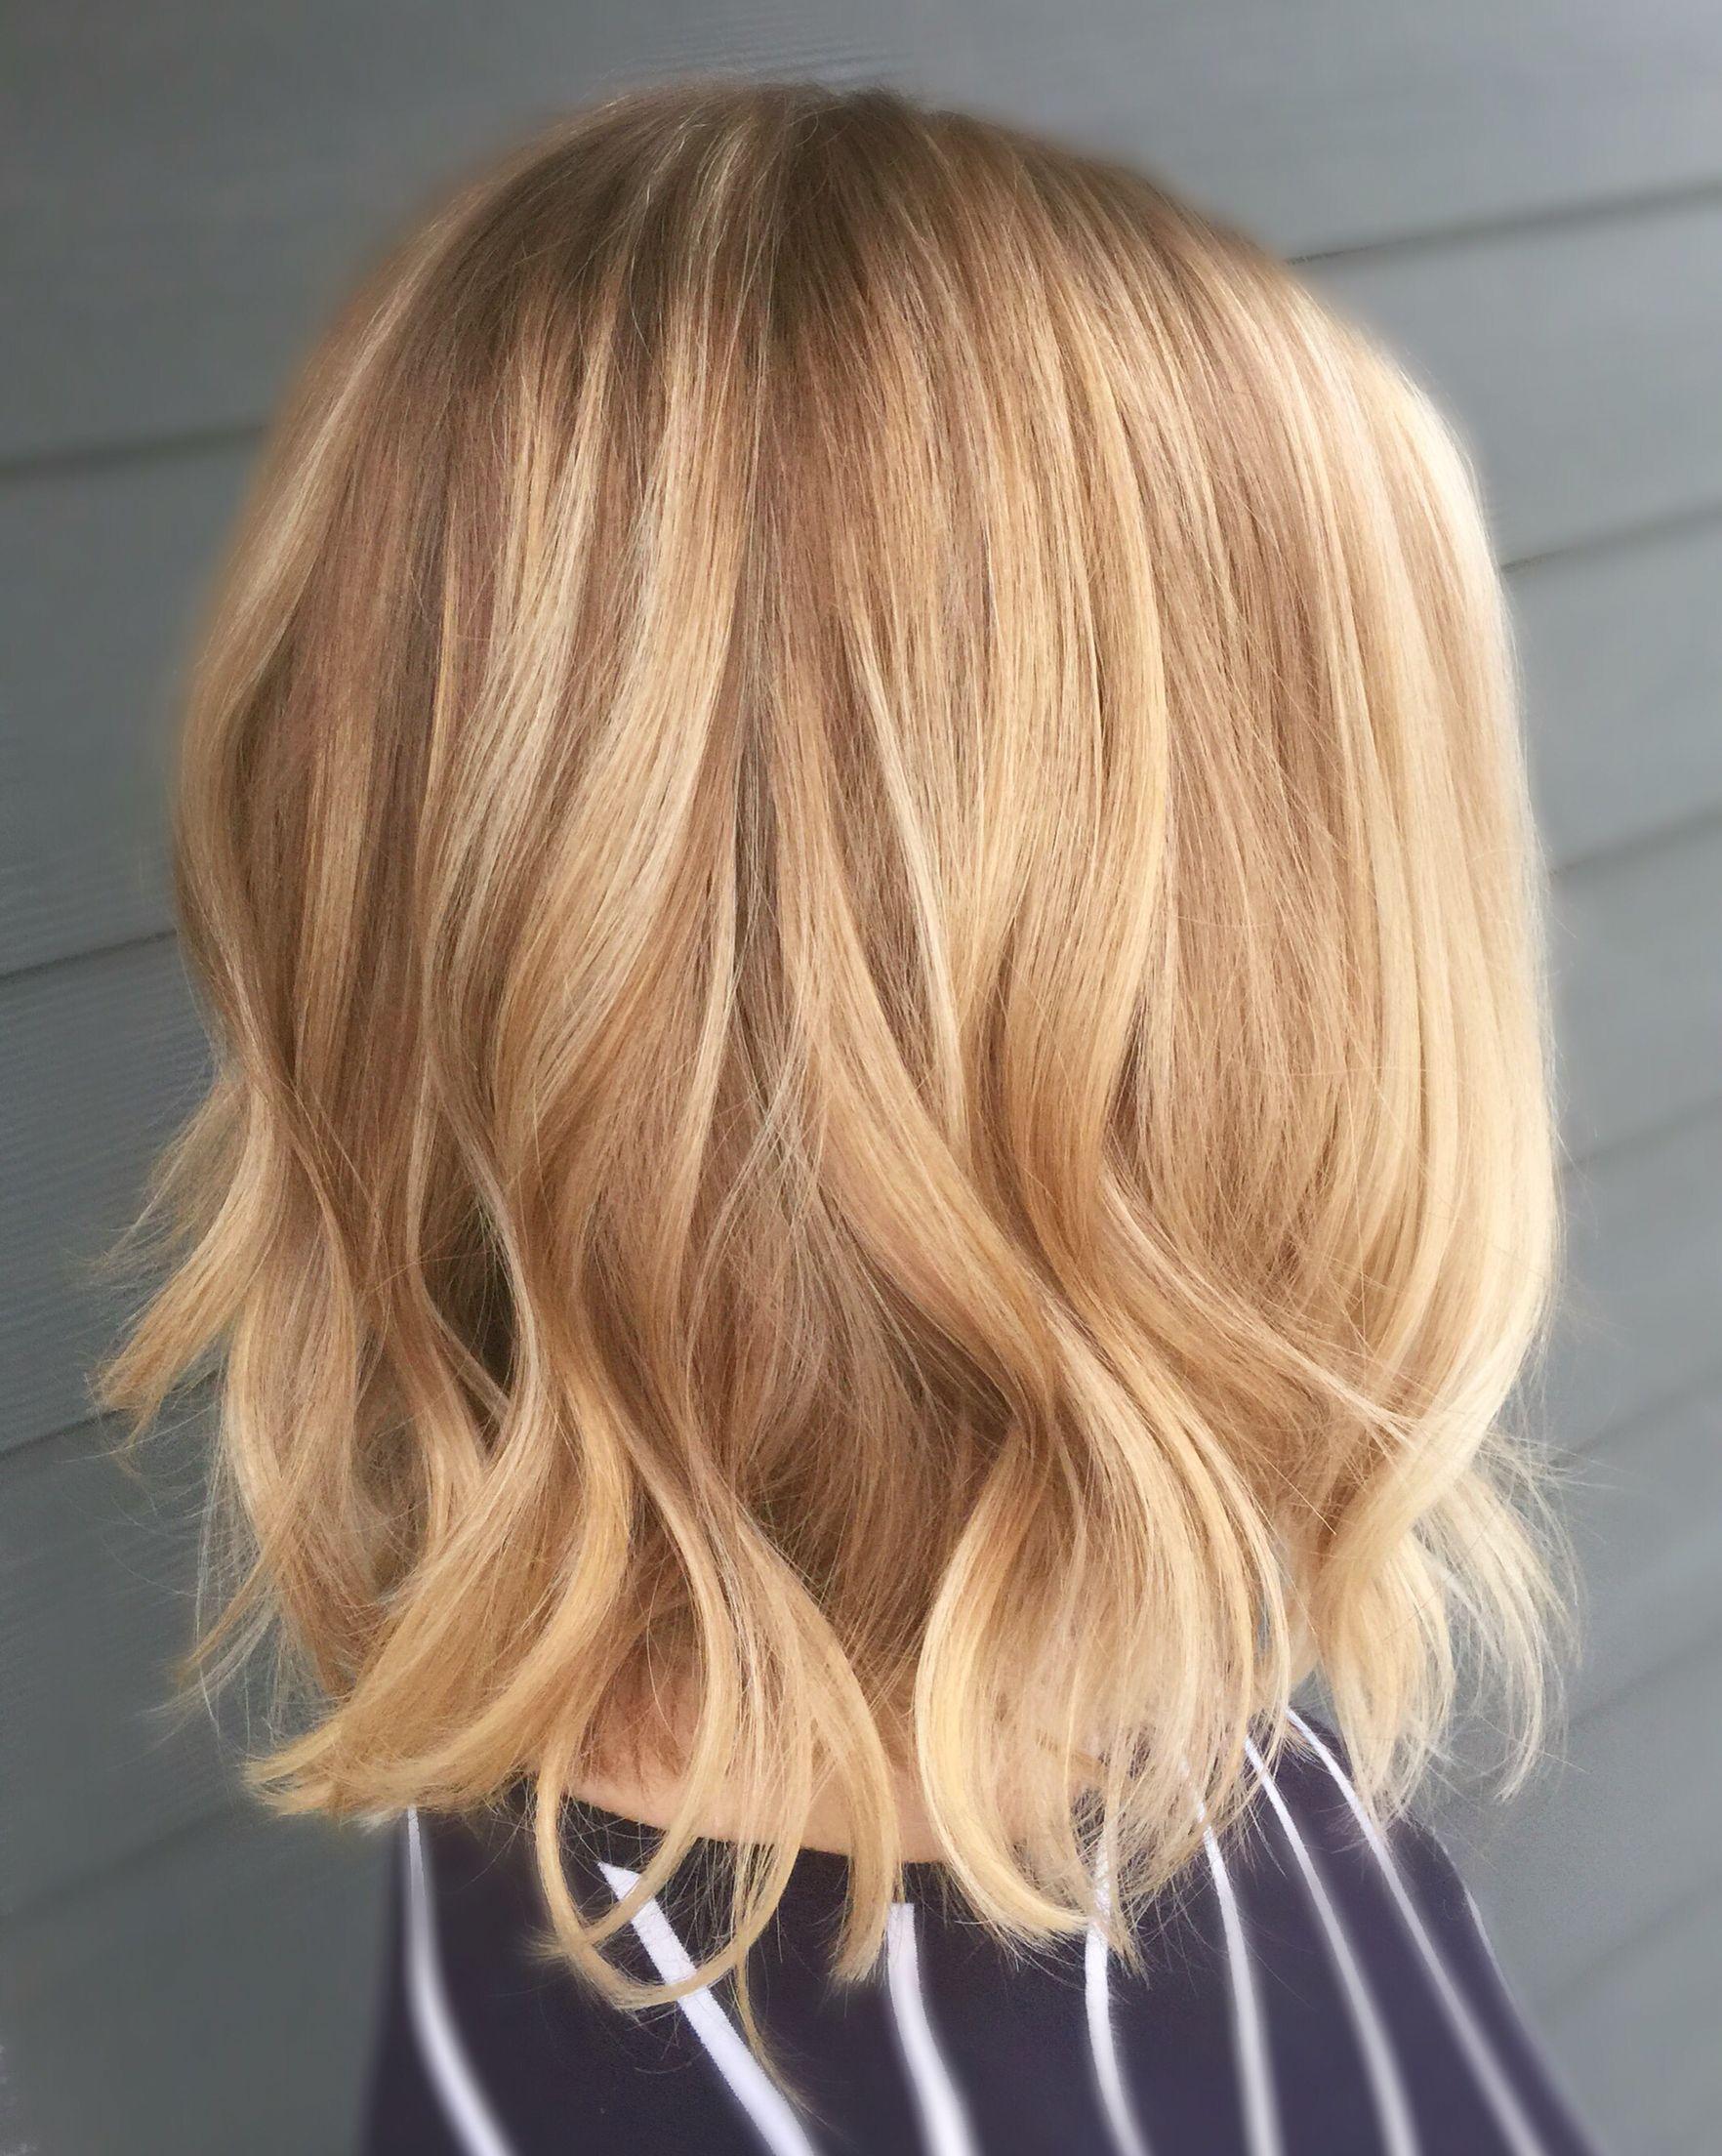 Phenomenal Blonde Balayage Short Hair Wavy Lob Curled Hair All Short Hairstyles For Black Women Fulllsitofus